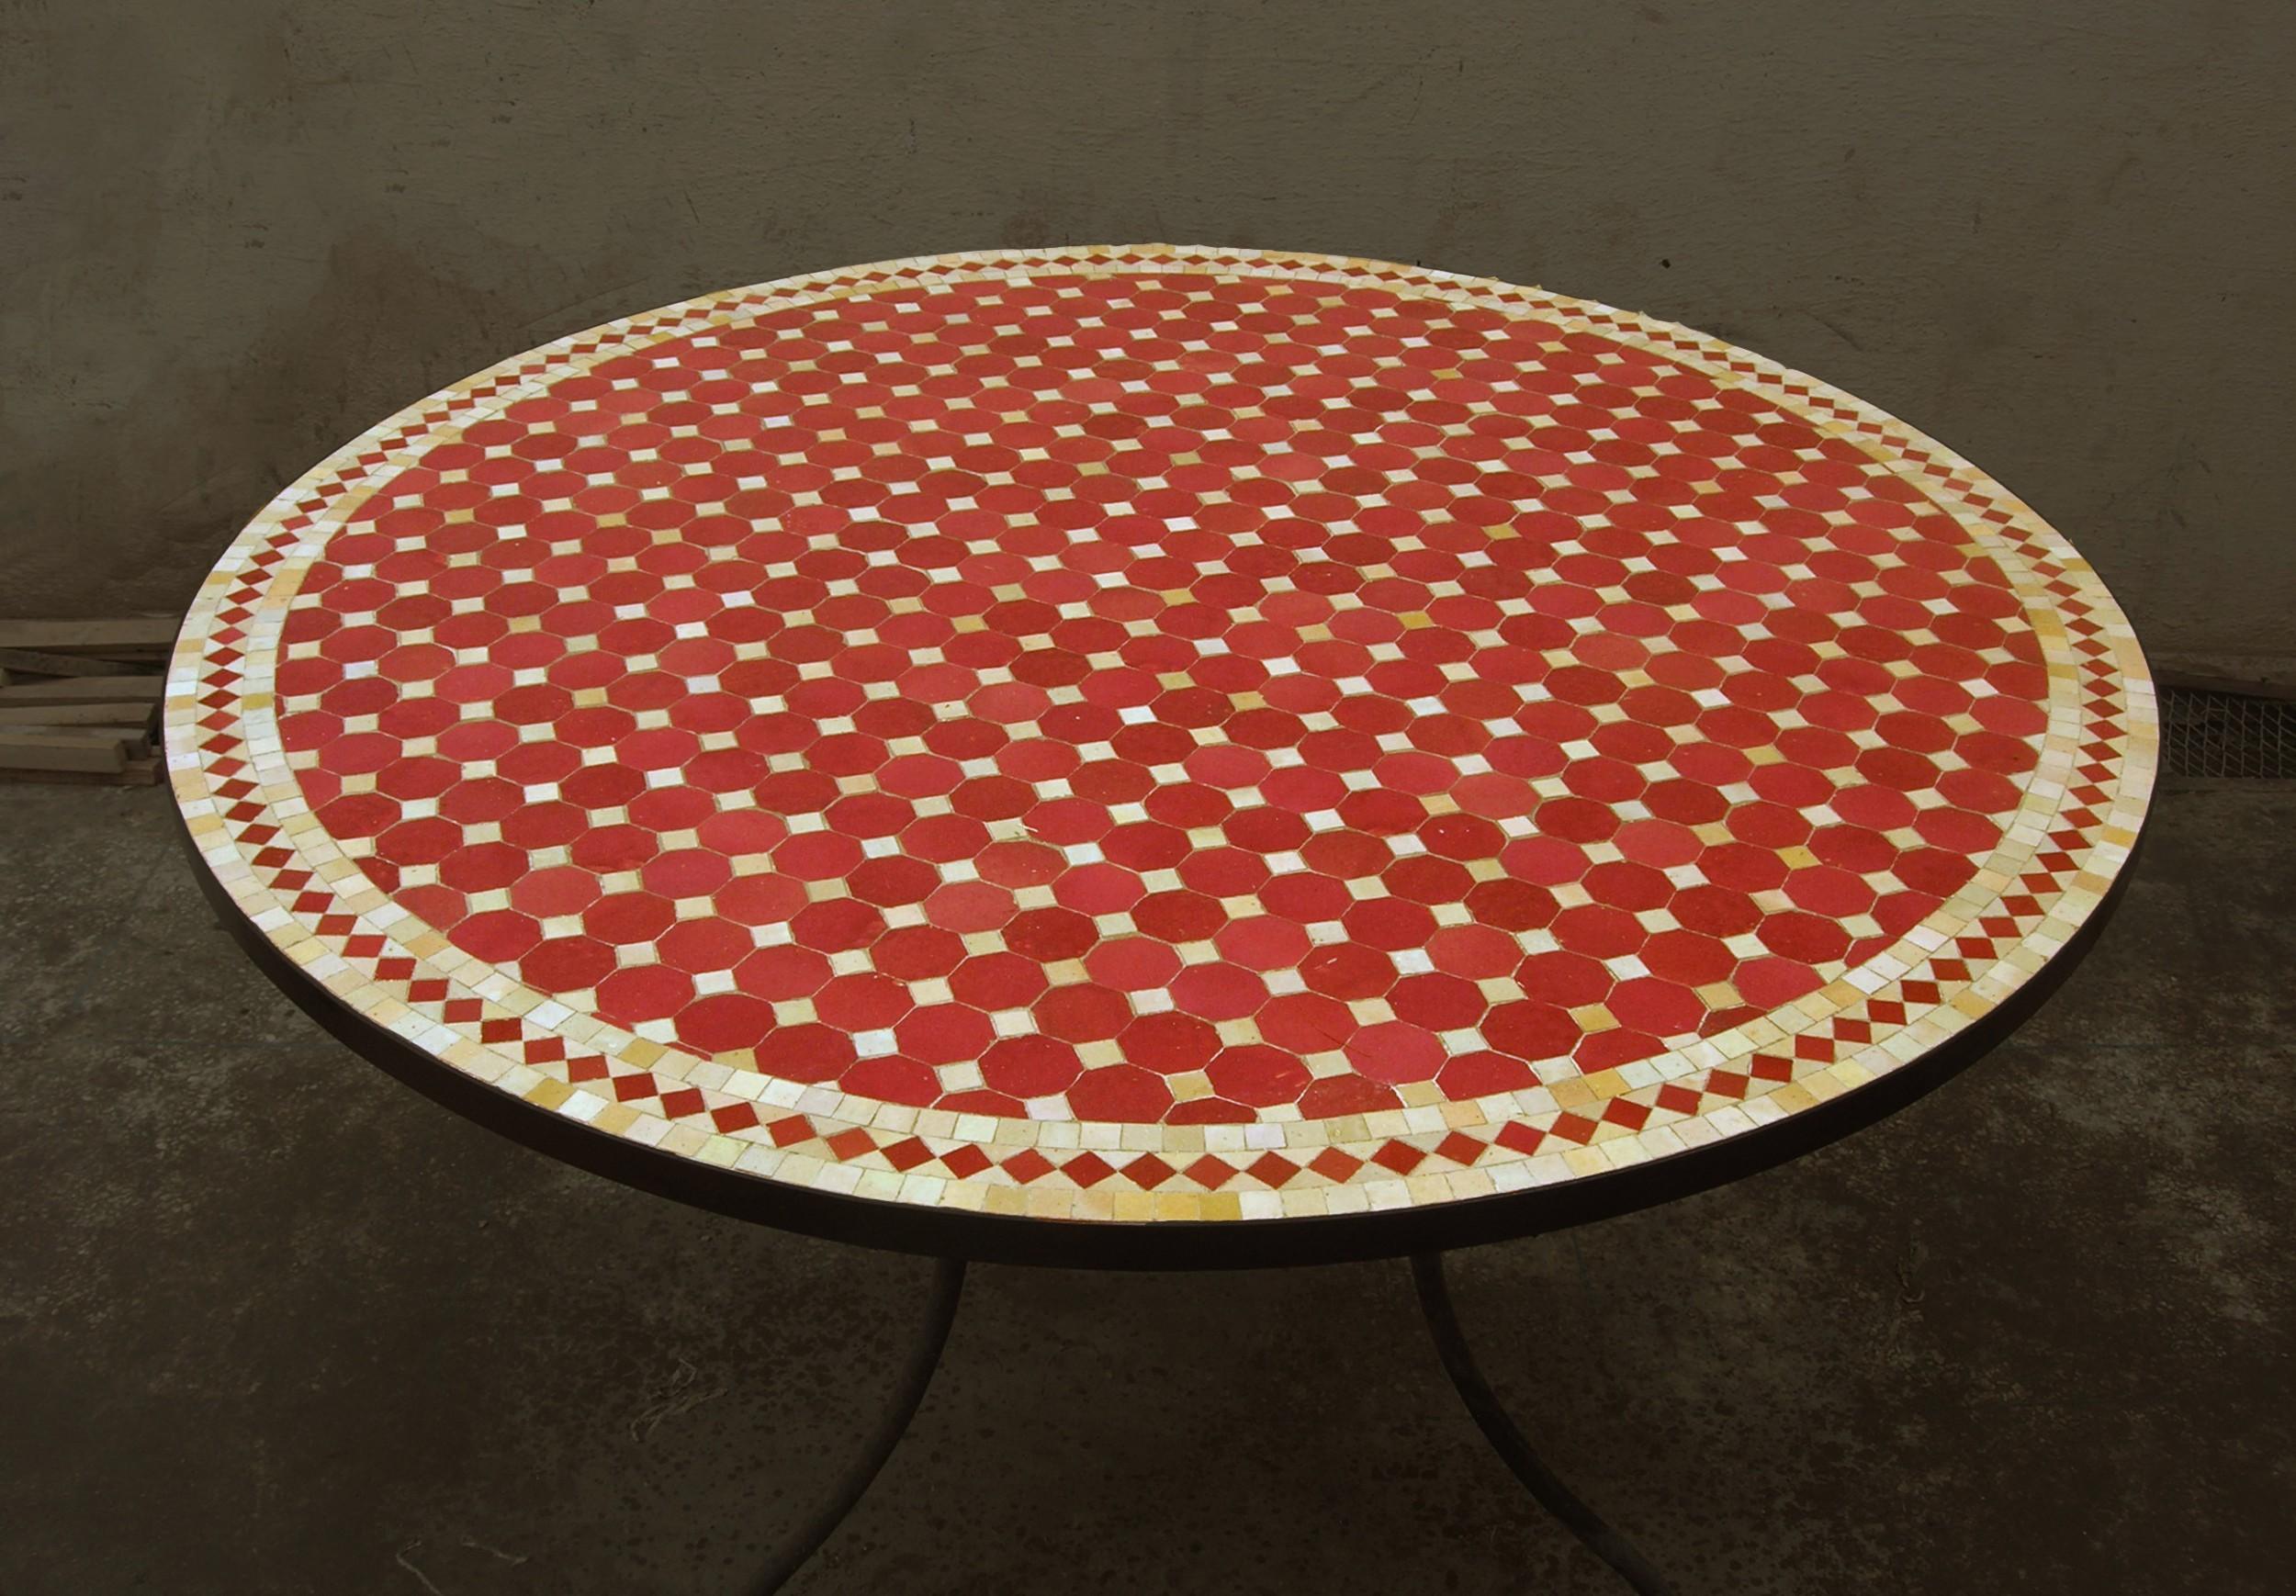 Table Ronde En Zellige Motif Tagra Art Et Sud Deco